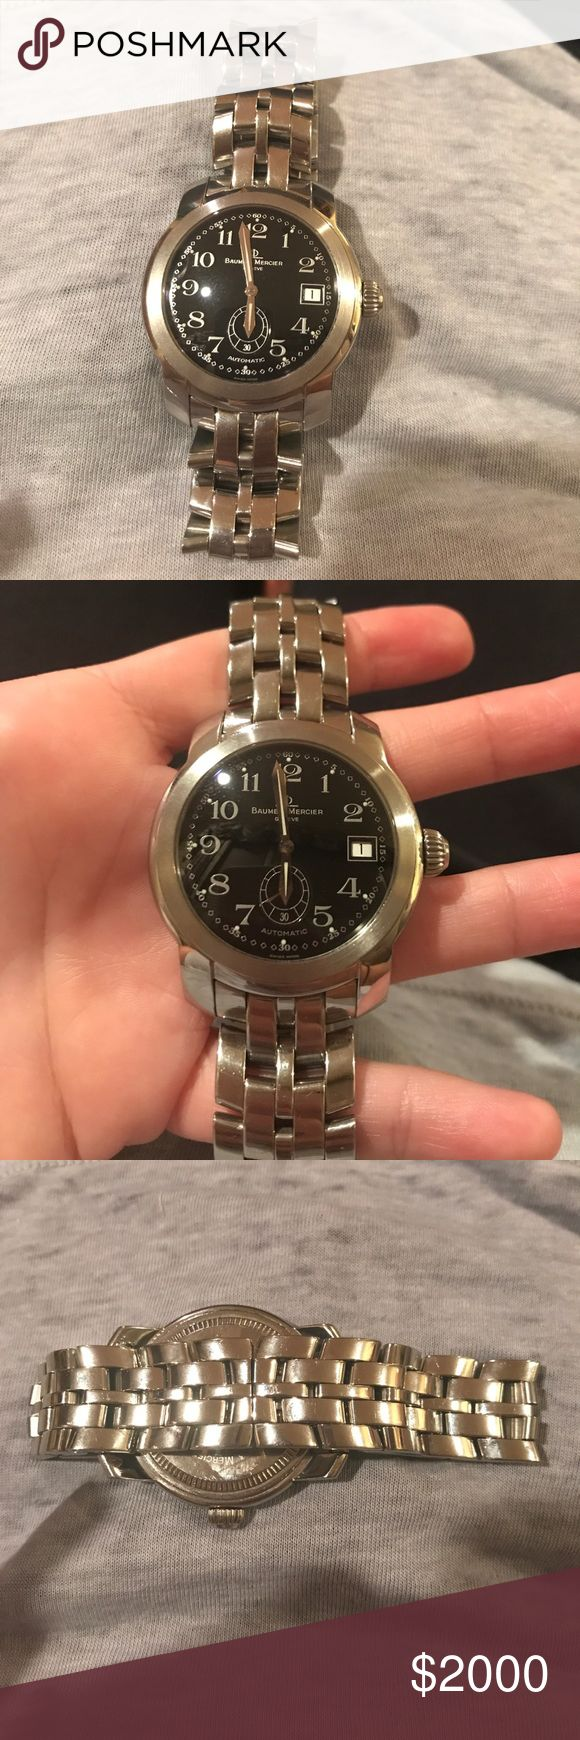 Baume & Mercier Swiss luxury watch Women's luxury watch. Brand new never worn. Silver with black face. baume & mercier Jewelry